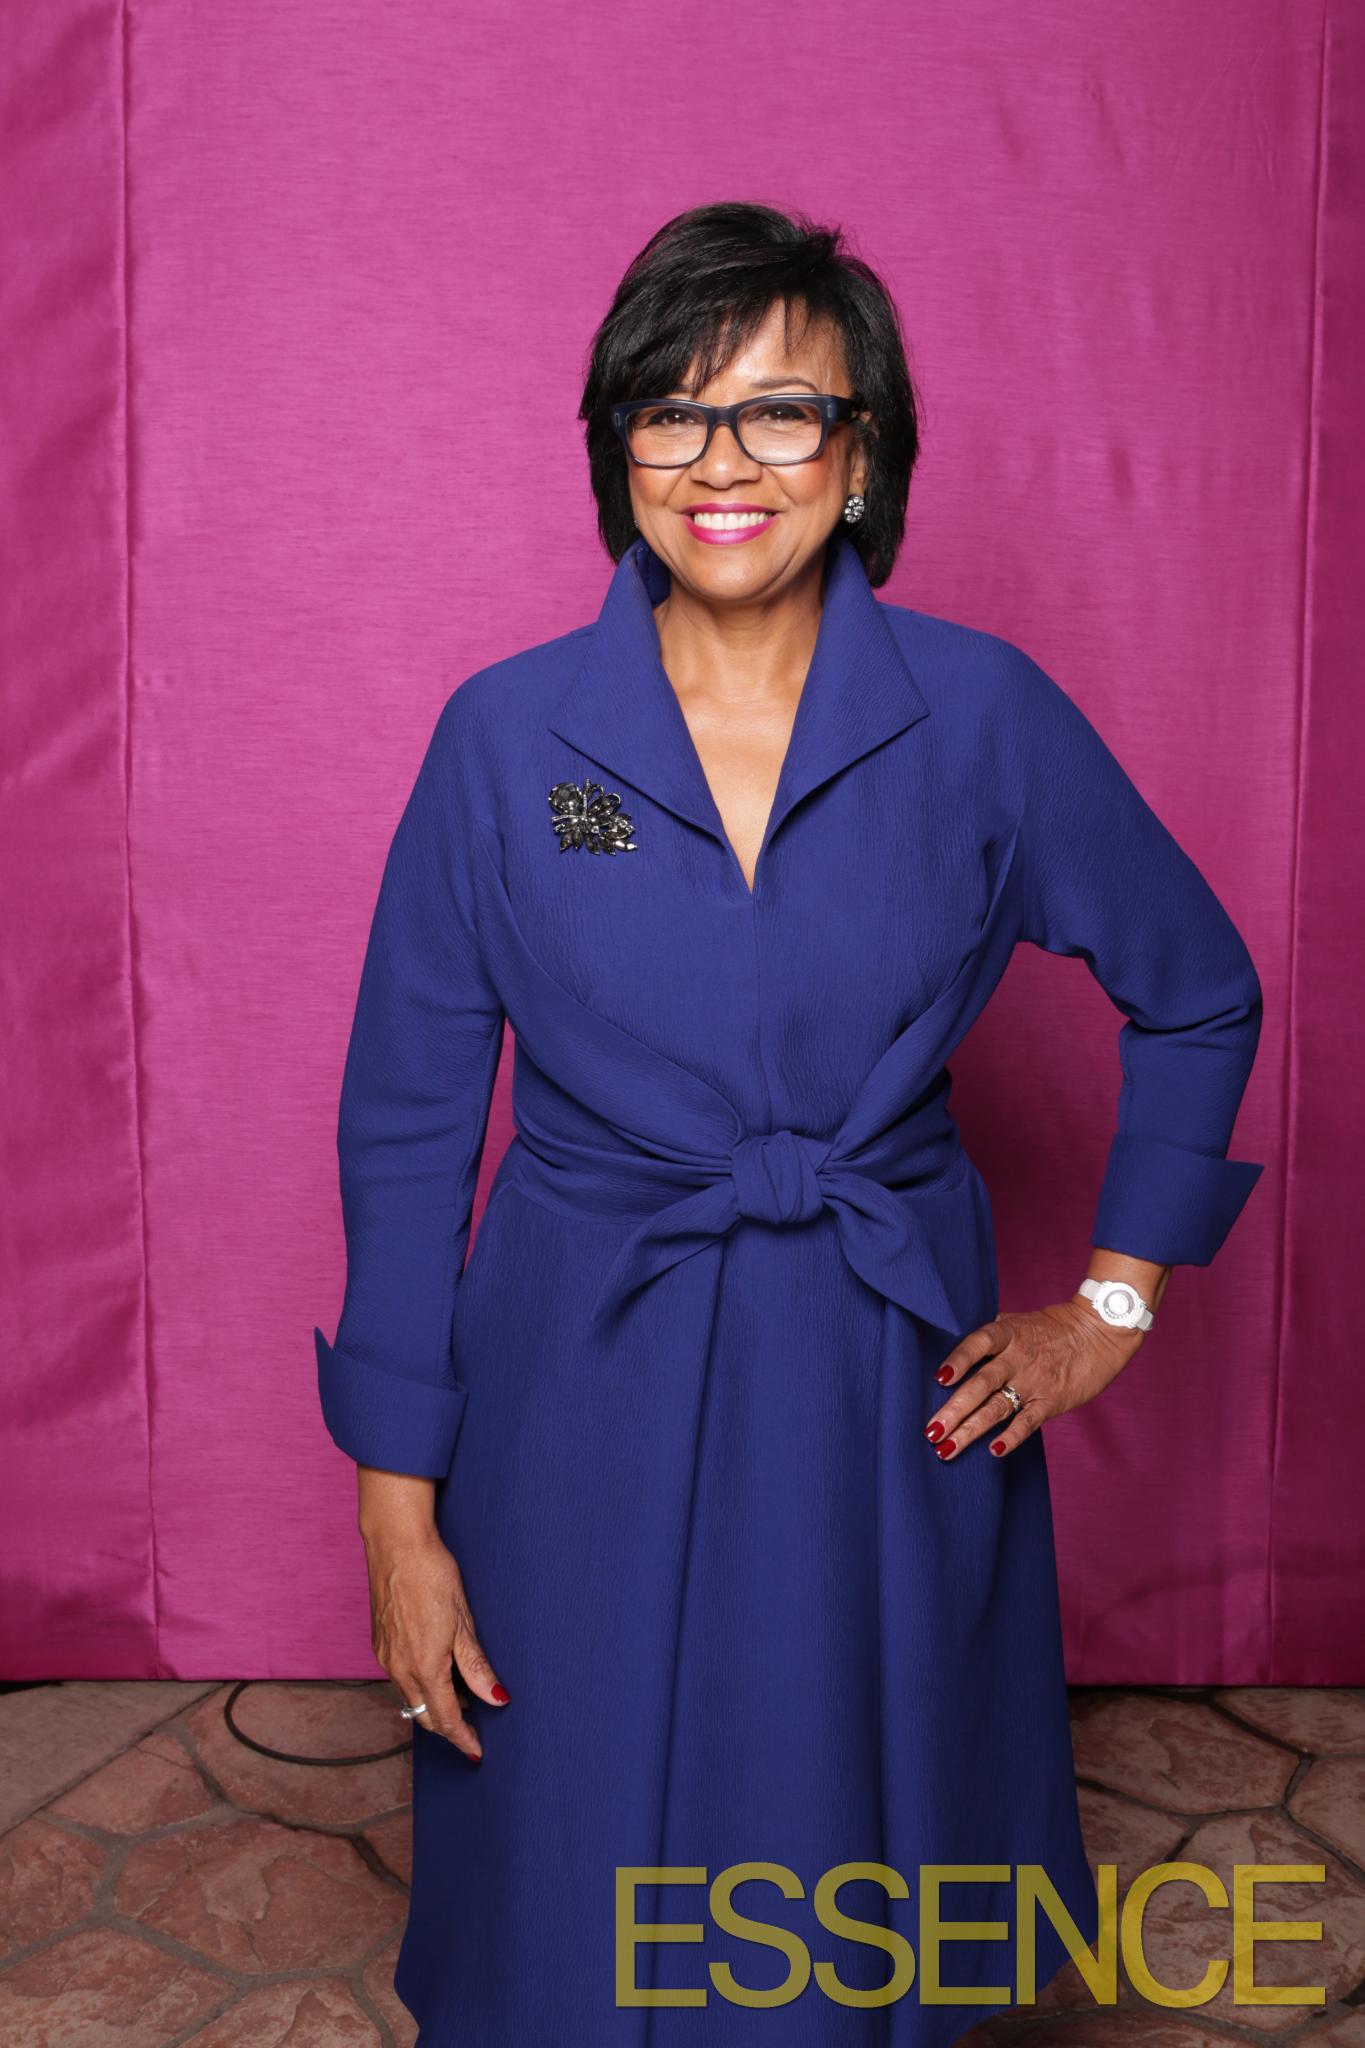 Academy President Cheryl Boone-Isaacs Responds to Lack of Oscars Diversity